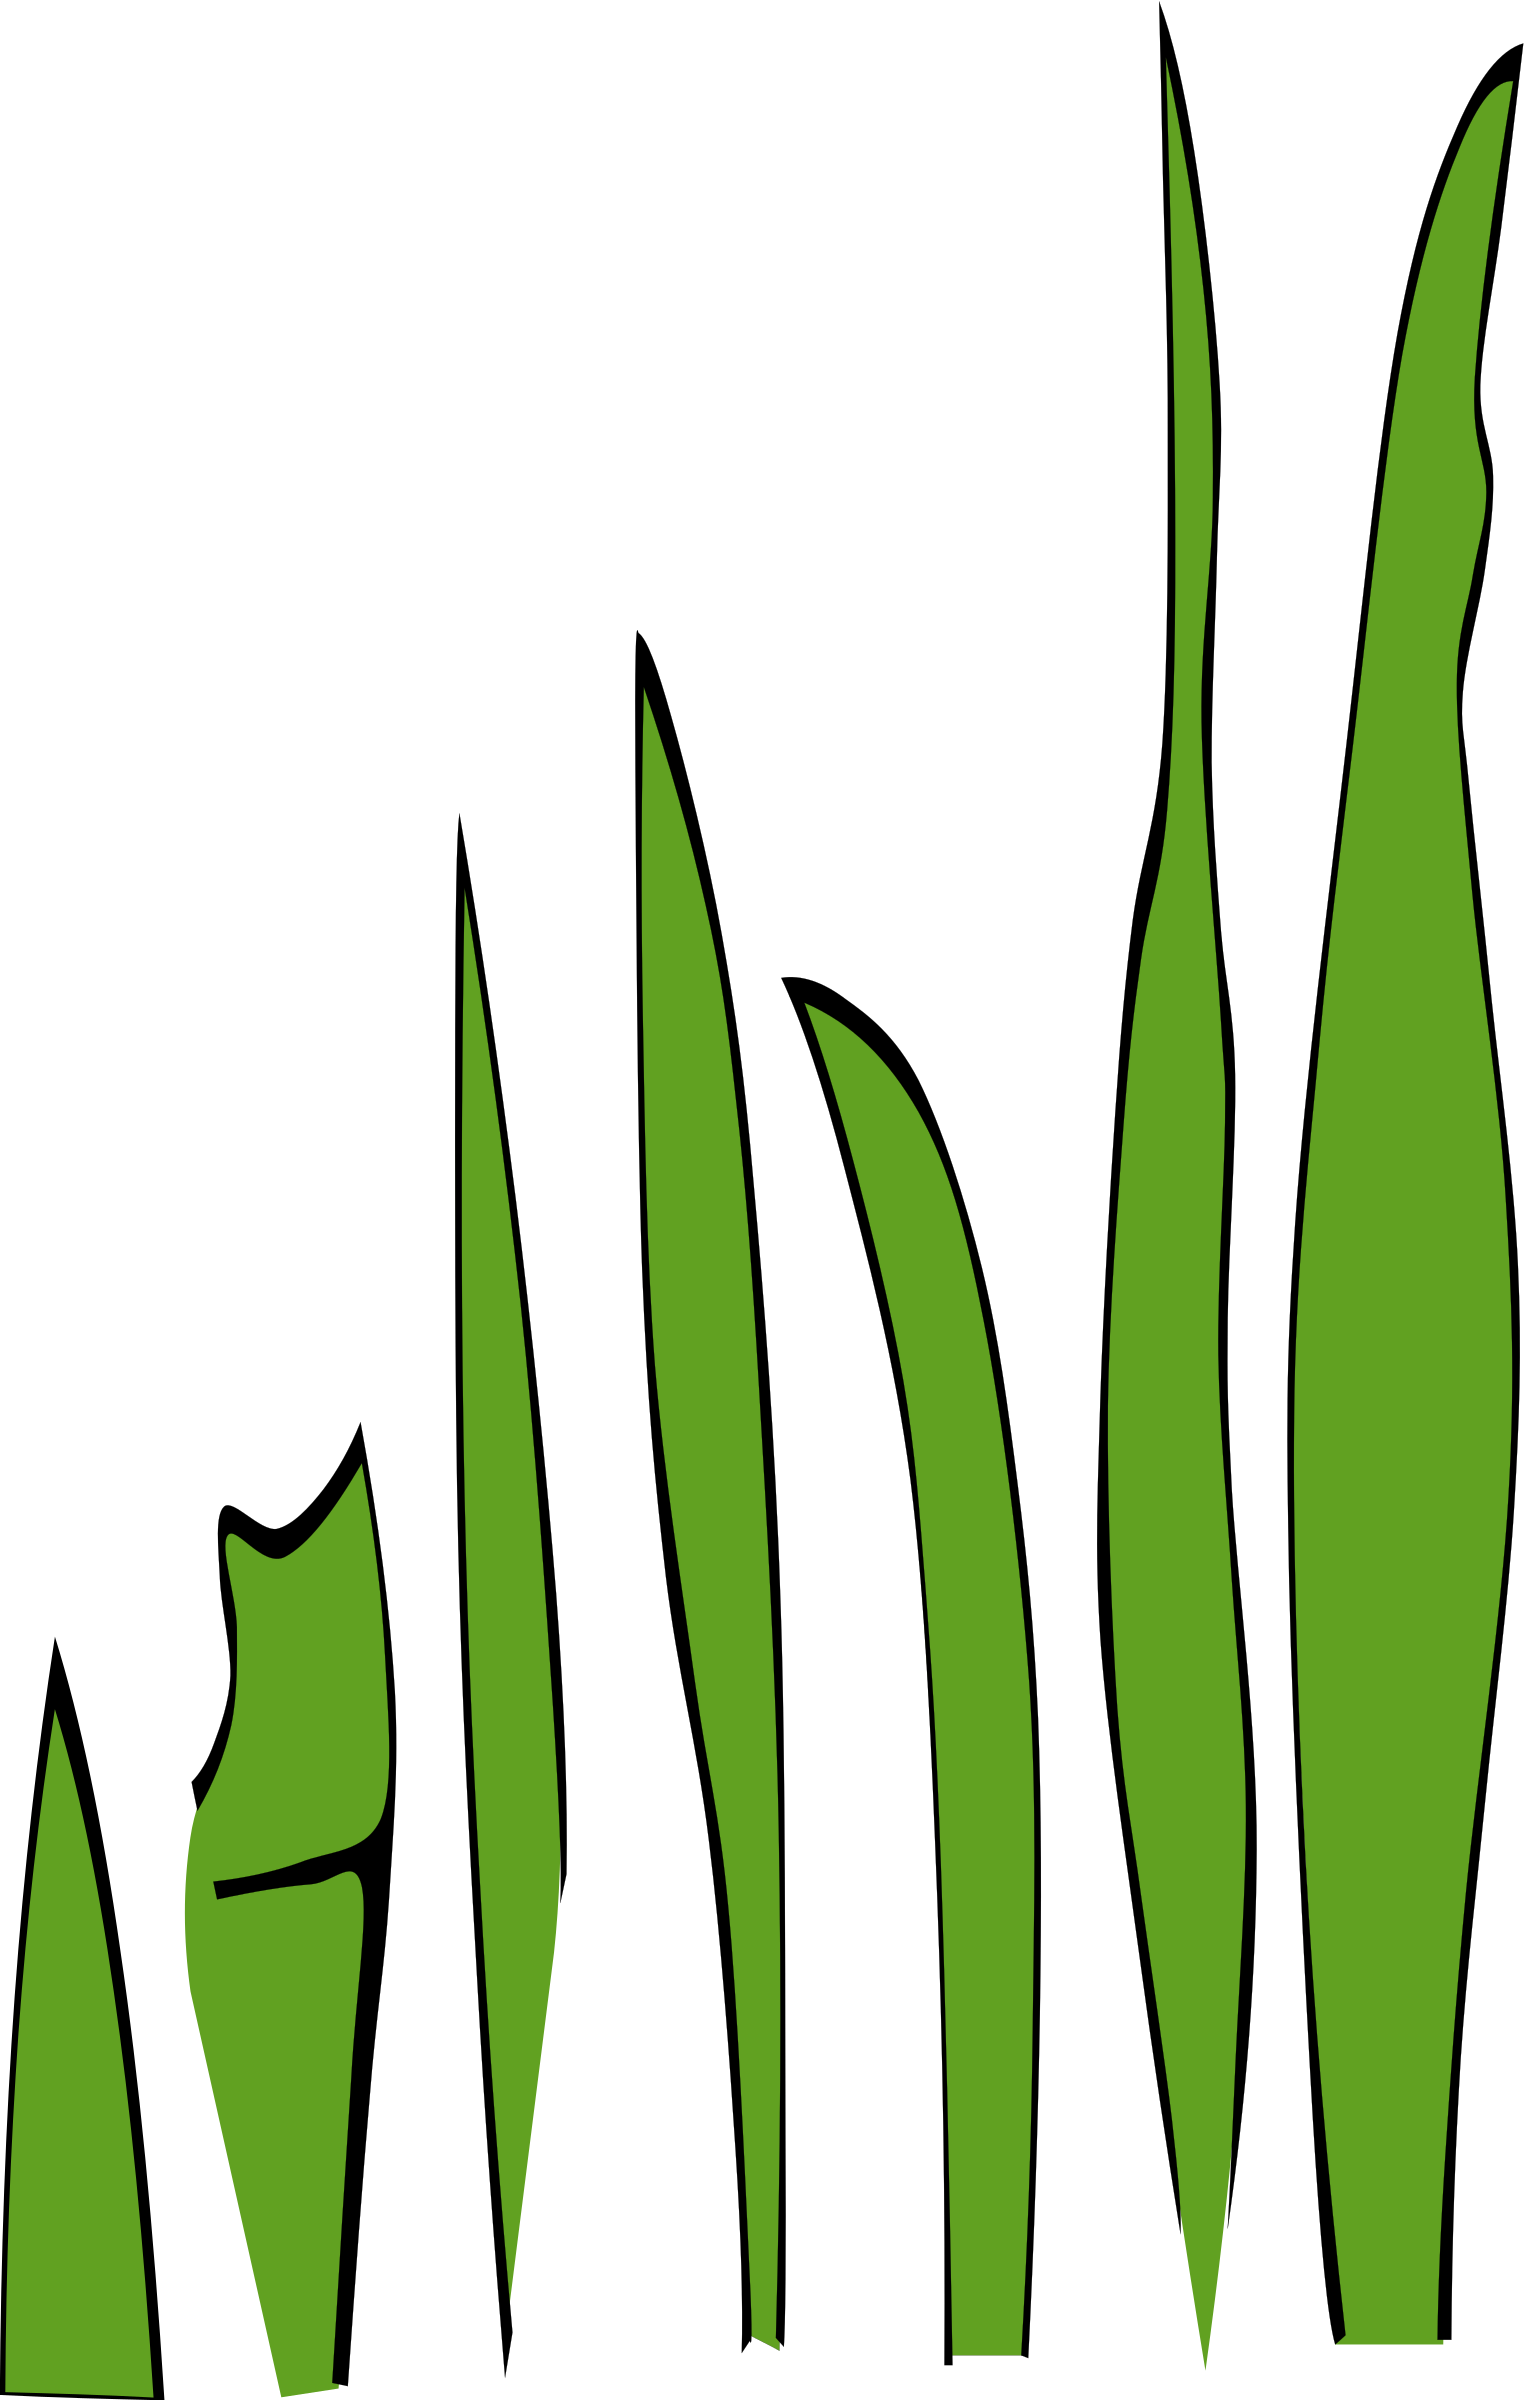 Green clipart okra. Grass blades and clumps